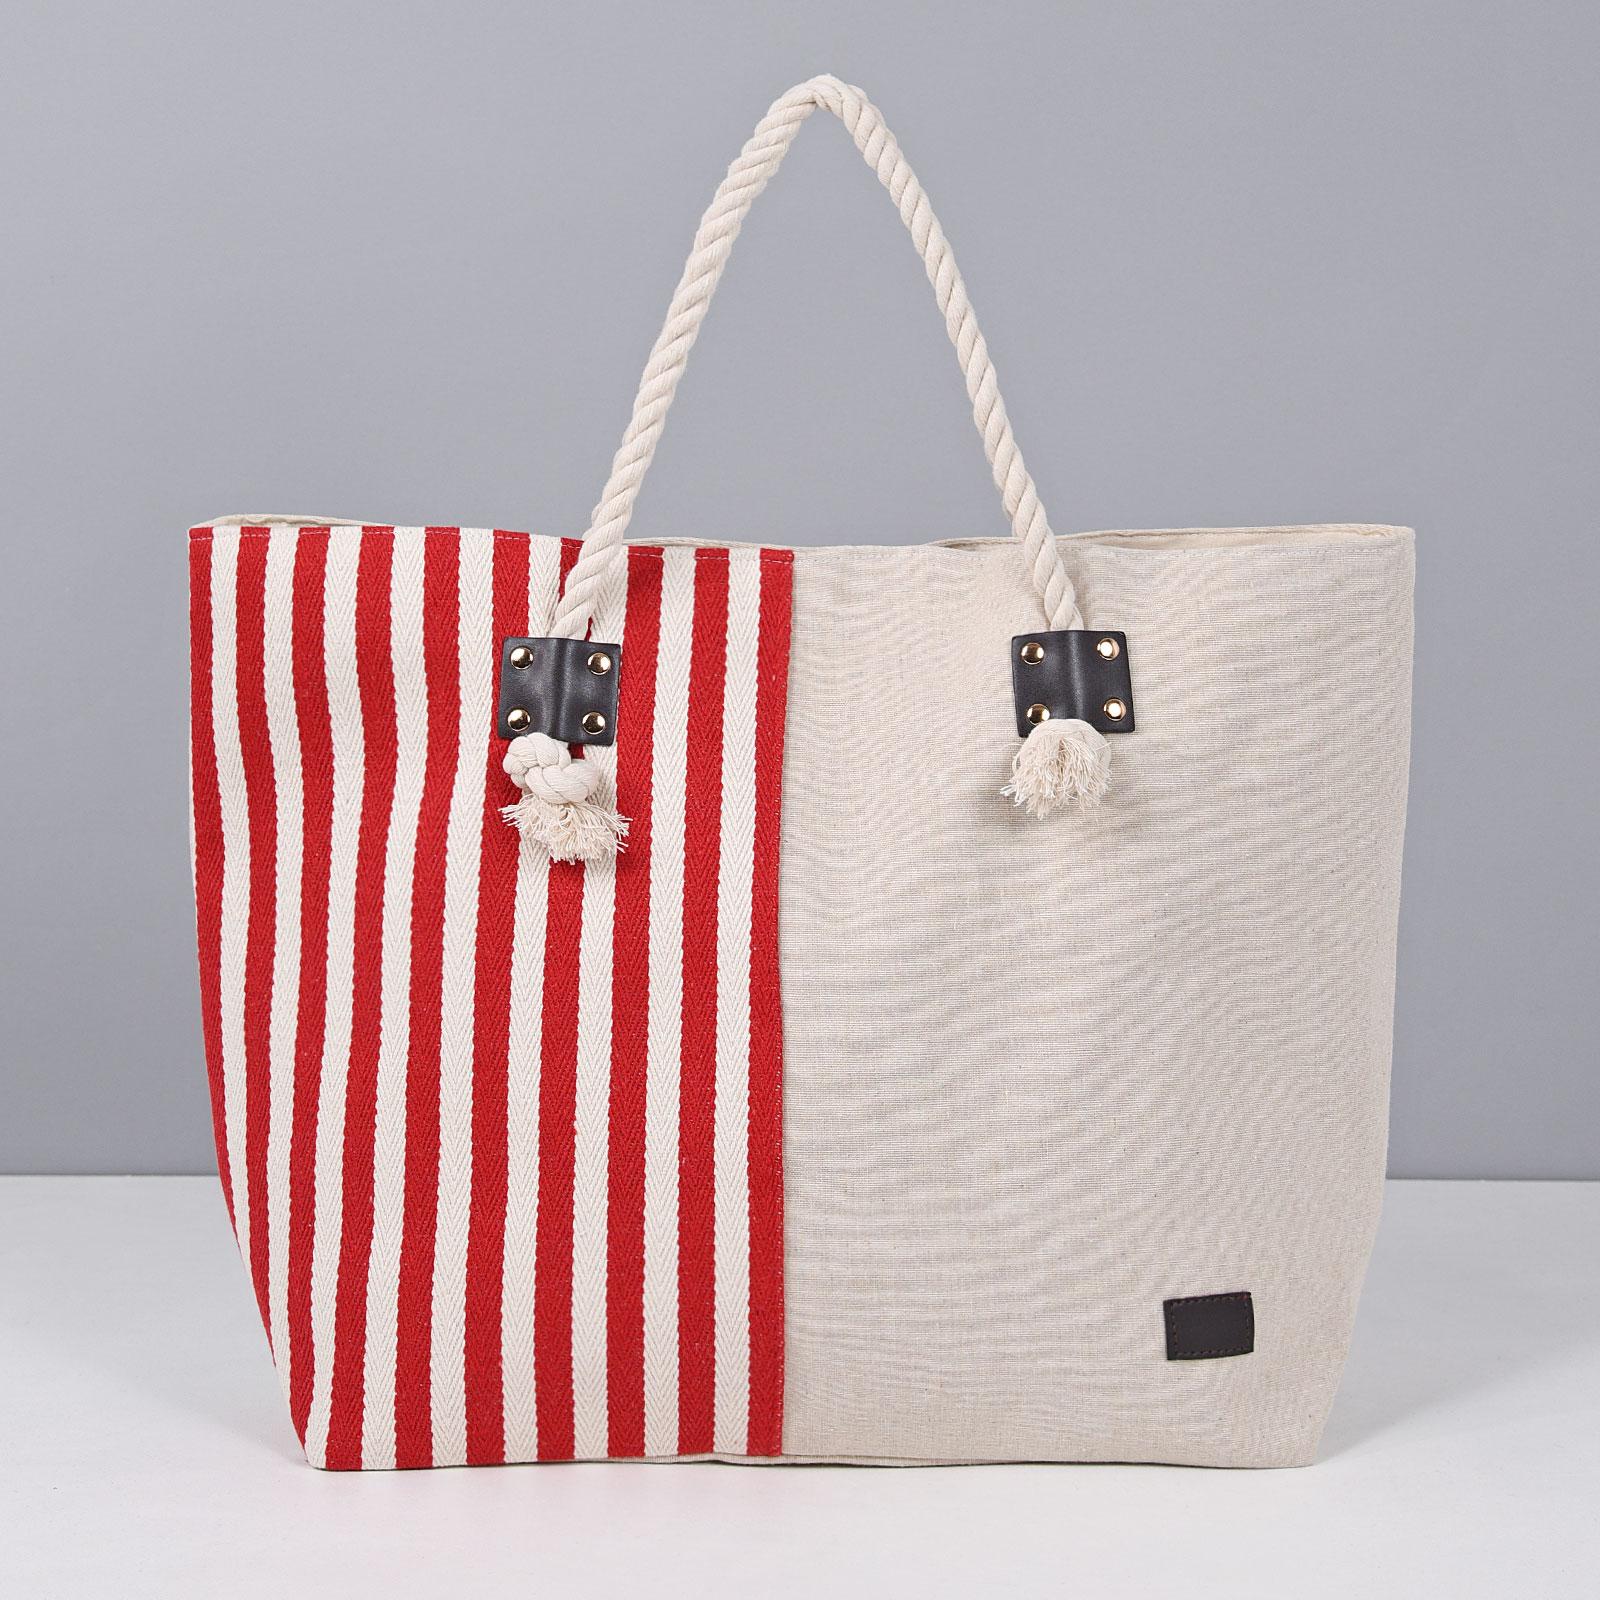 MQ-00117-F16-sac-de-plage-mariniere-rouge-blanc